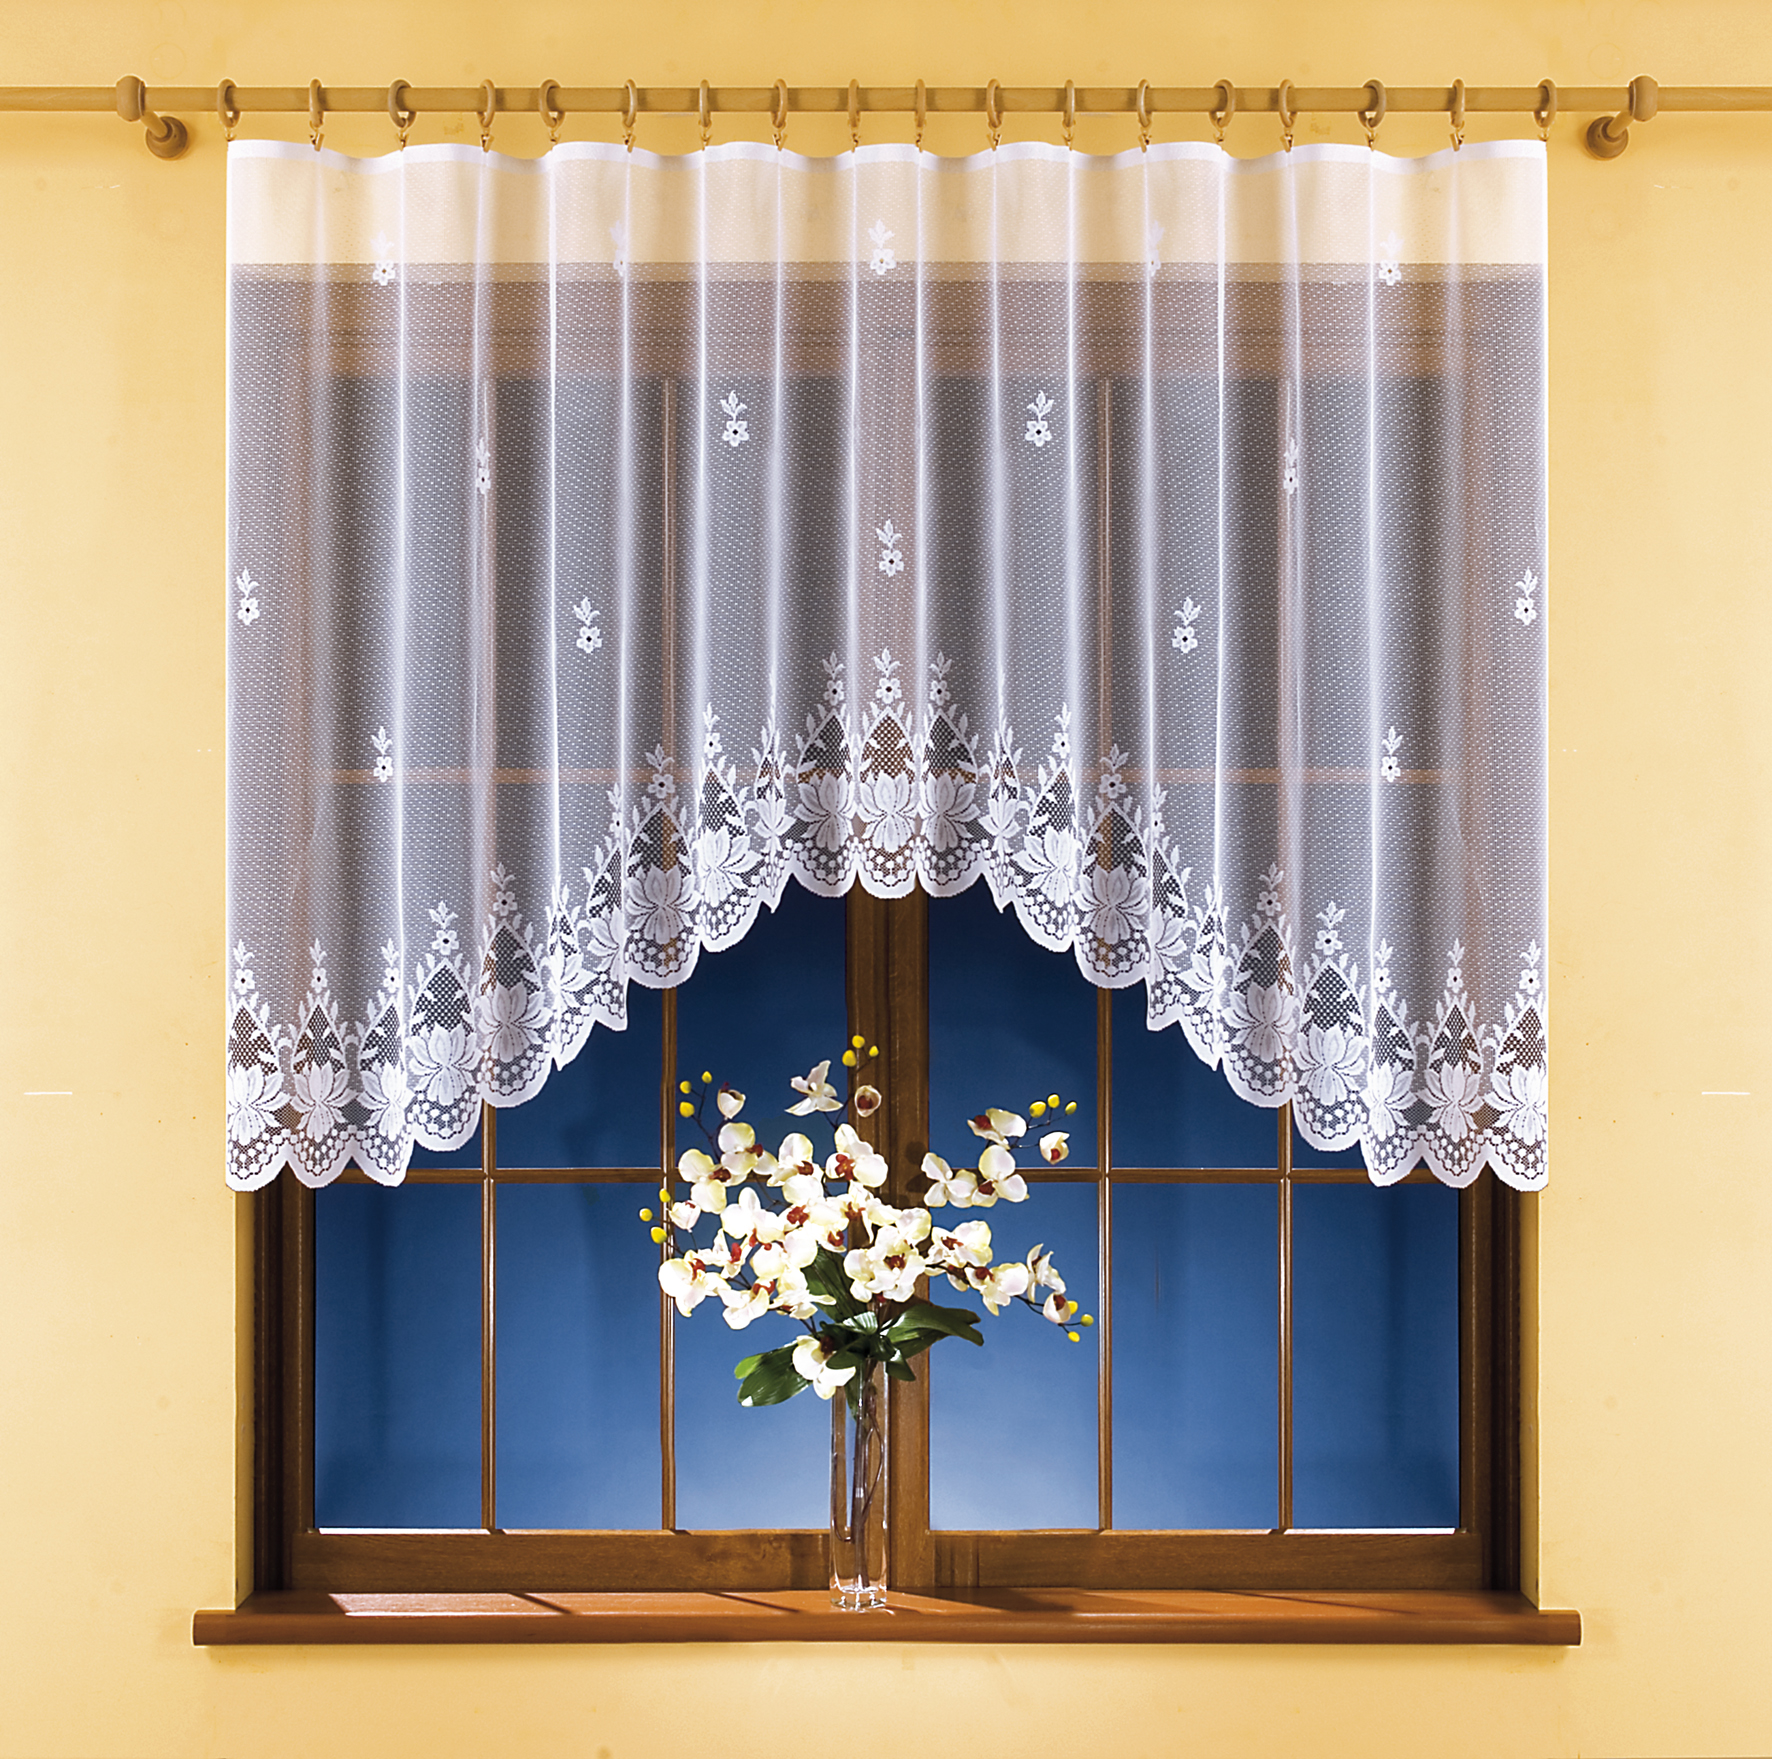 IVETA kusová záclona 300x140cm